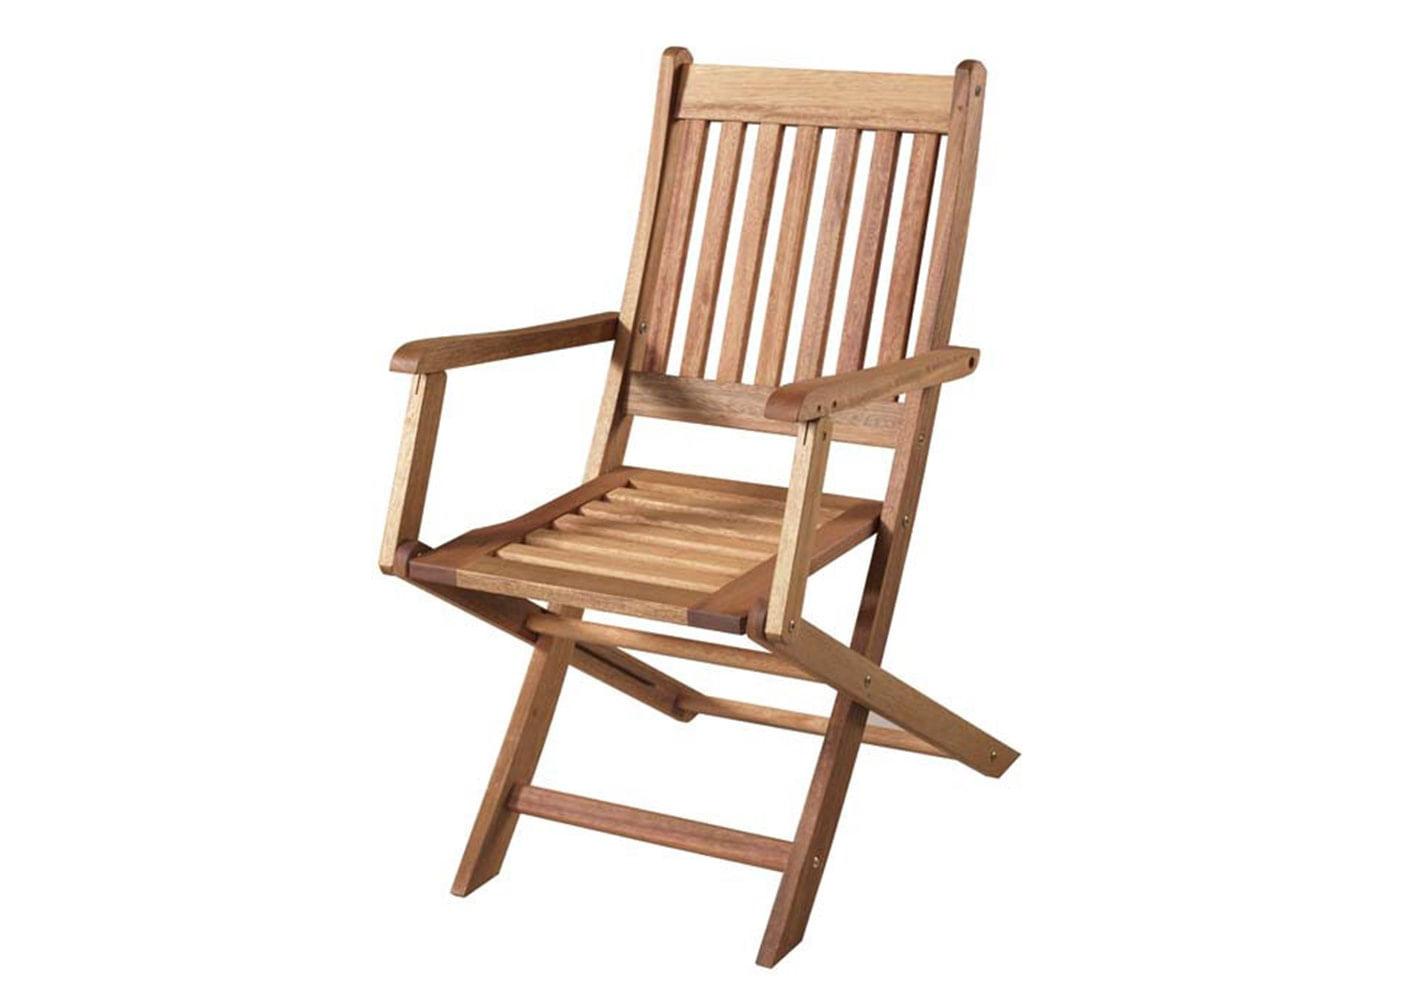 Cadeira Dobravel Com Braco Cor Stain Jatoba - 15555